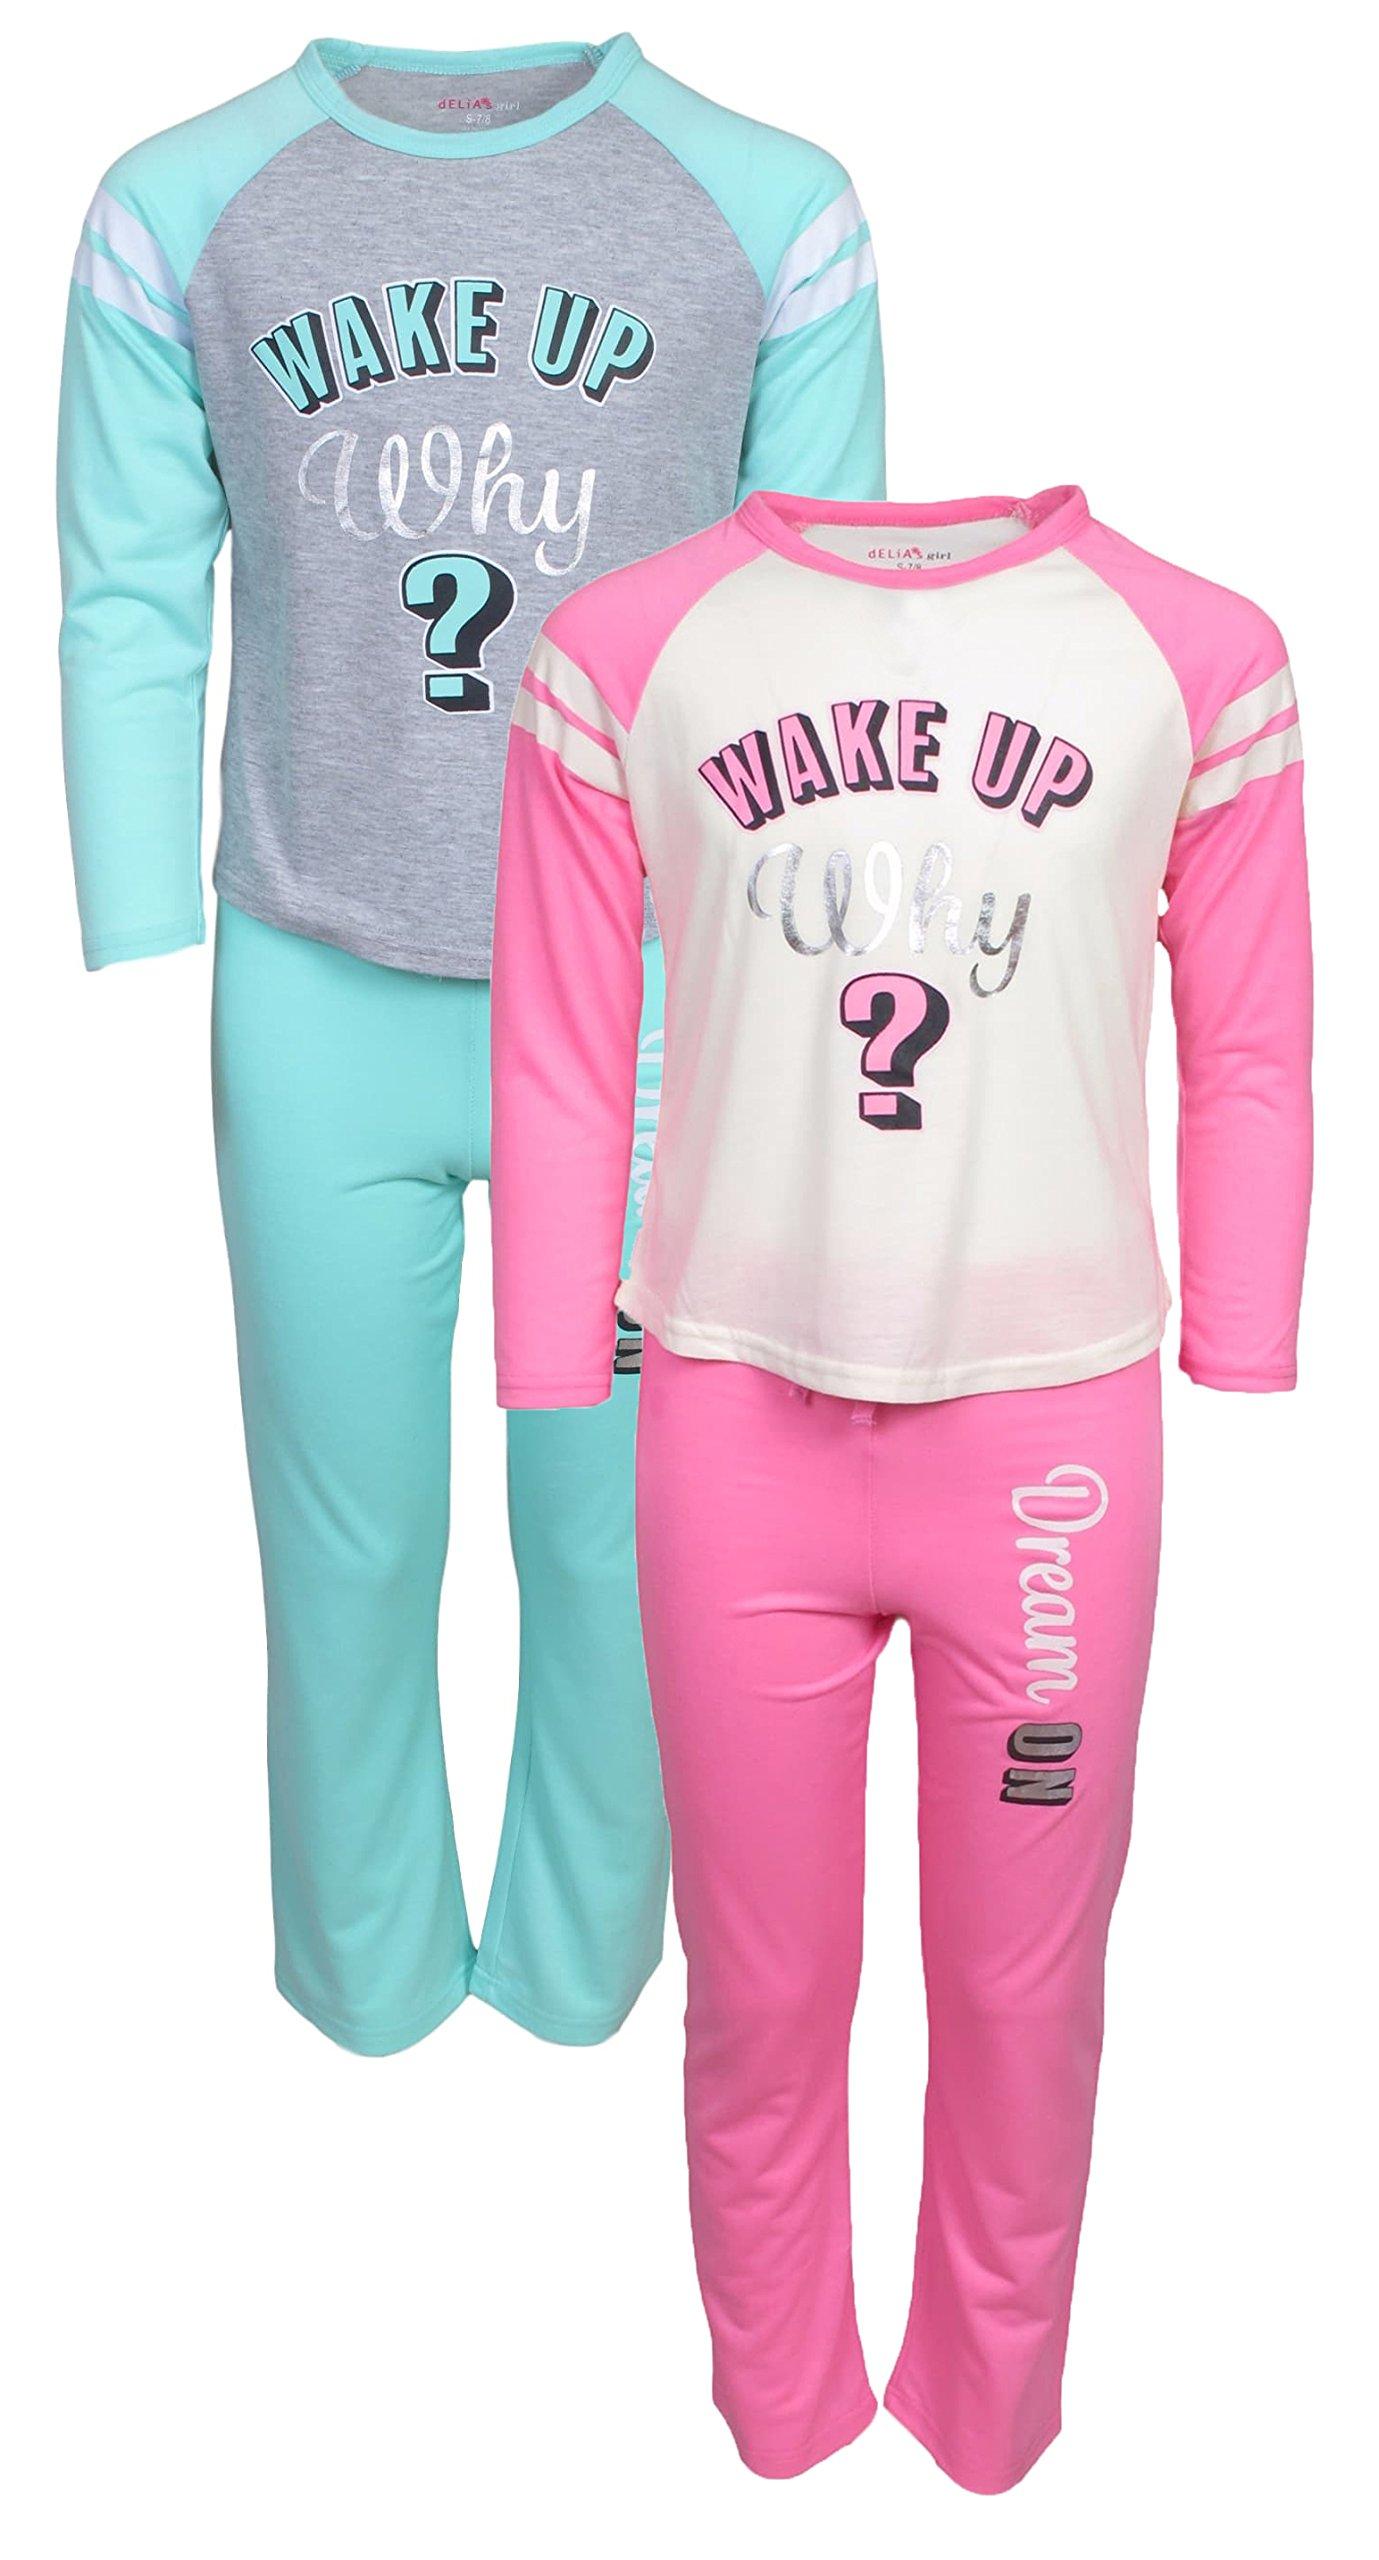 dELiA*s 'dELiAs Girls Pajama Sleepwear Sets Long Sleeve Shirts With Pants, Wake Up, Size 6X'